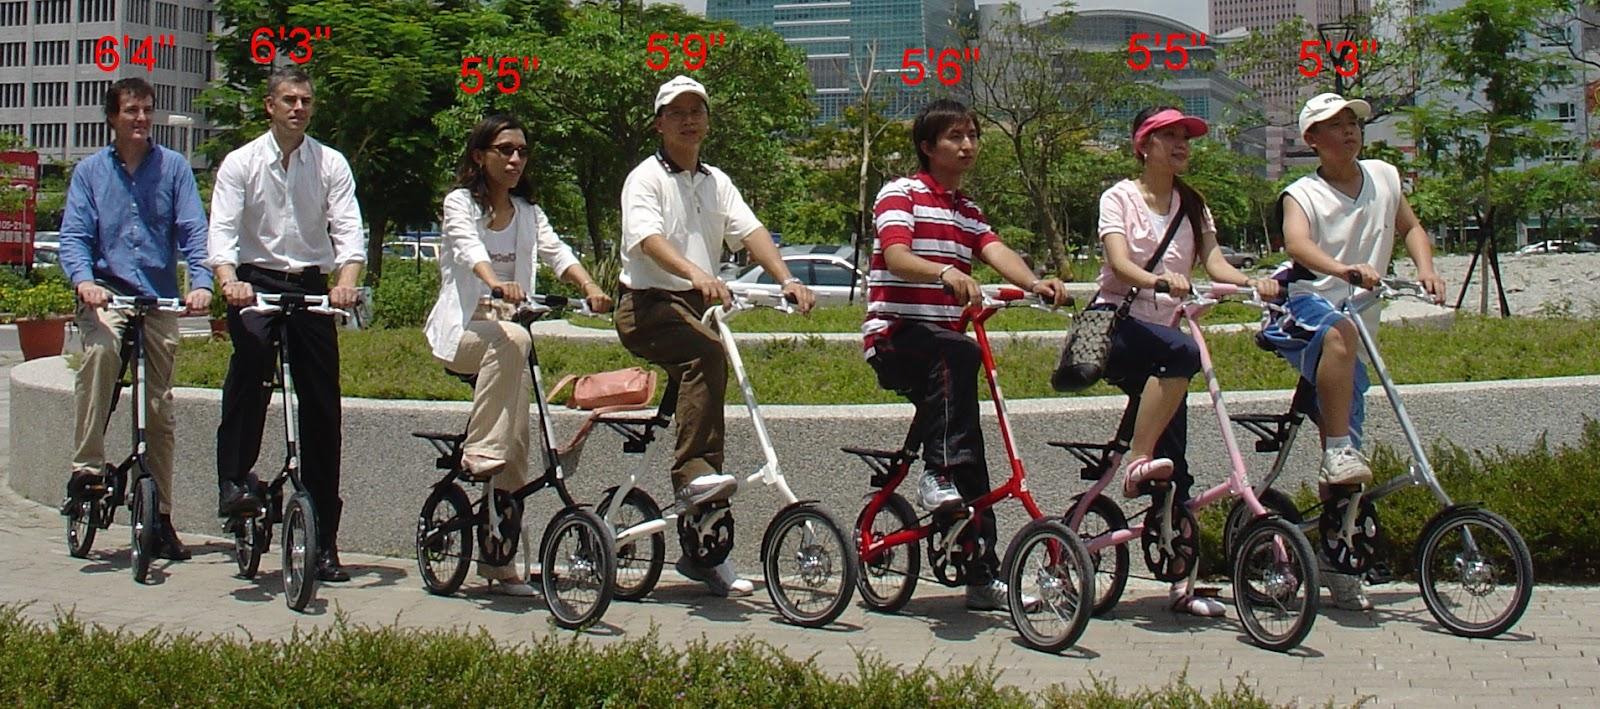 "Range of riders 6'4"" to 5'3"""